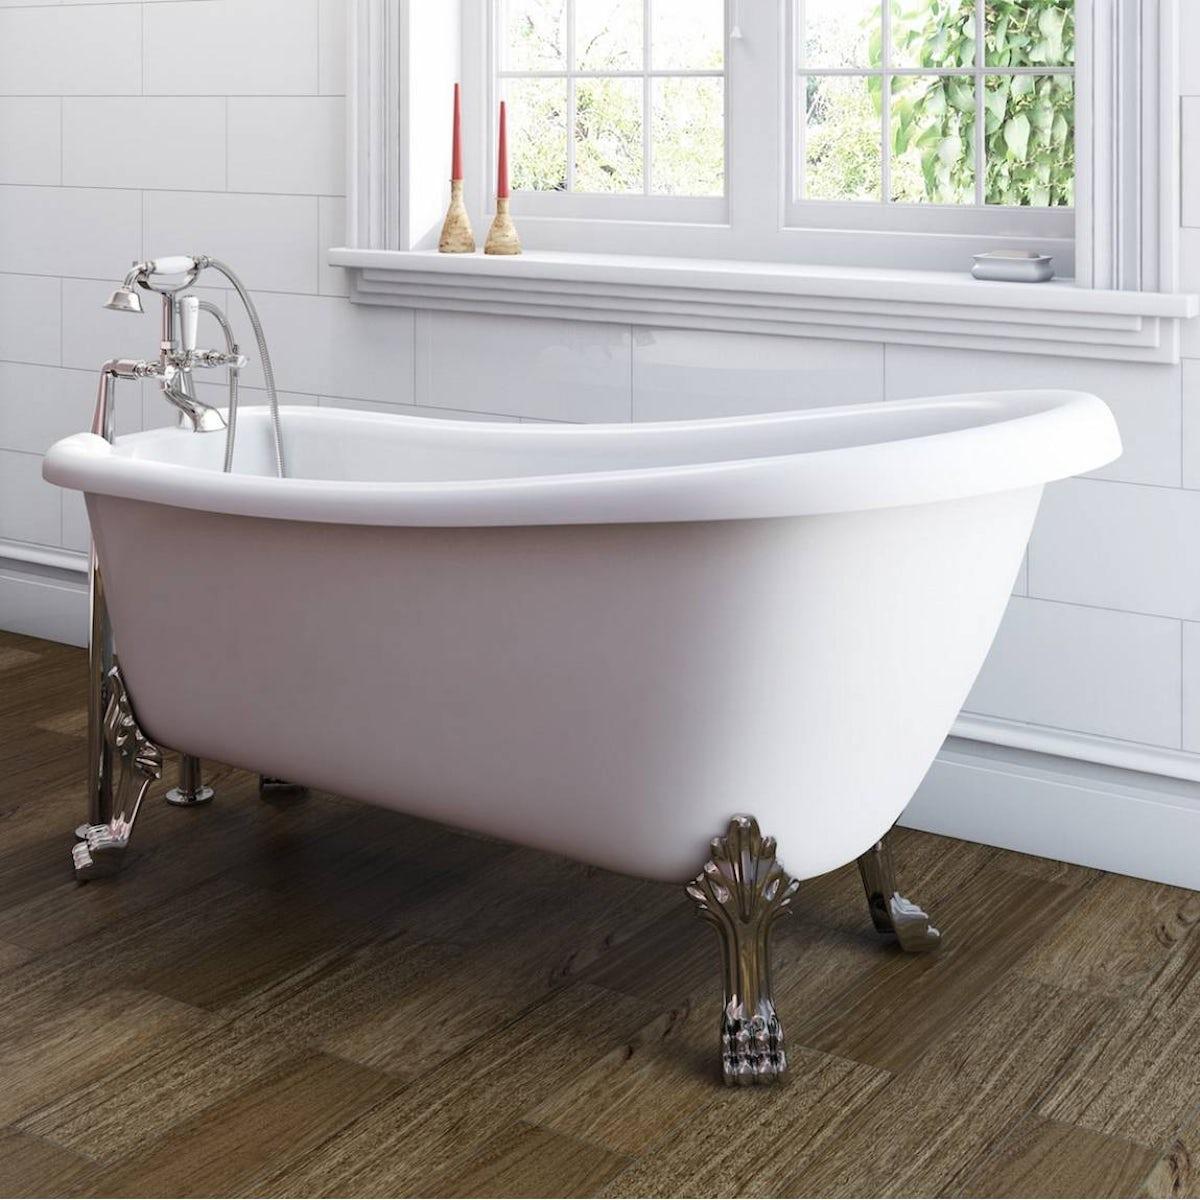 Winchester slipper bath with dragon feet 1540 x 720 offer for Small baths 1200